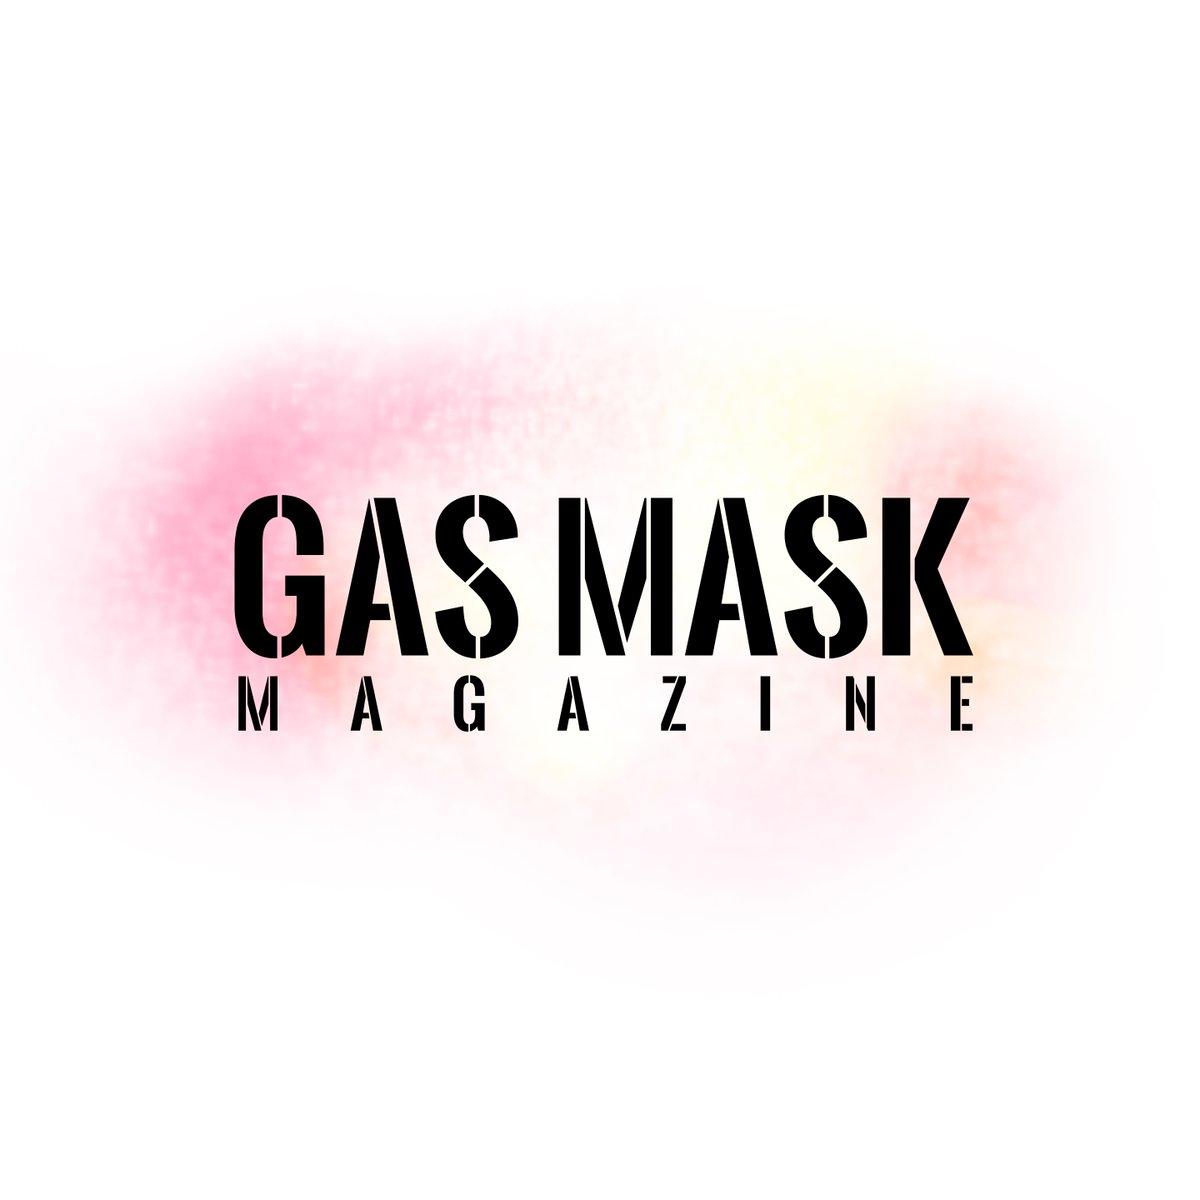 GAS MASK MAGAZINE